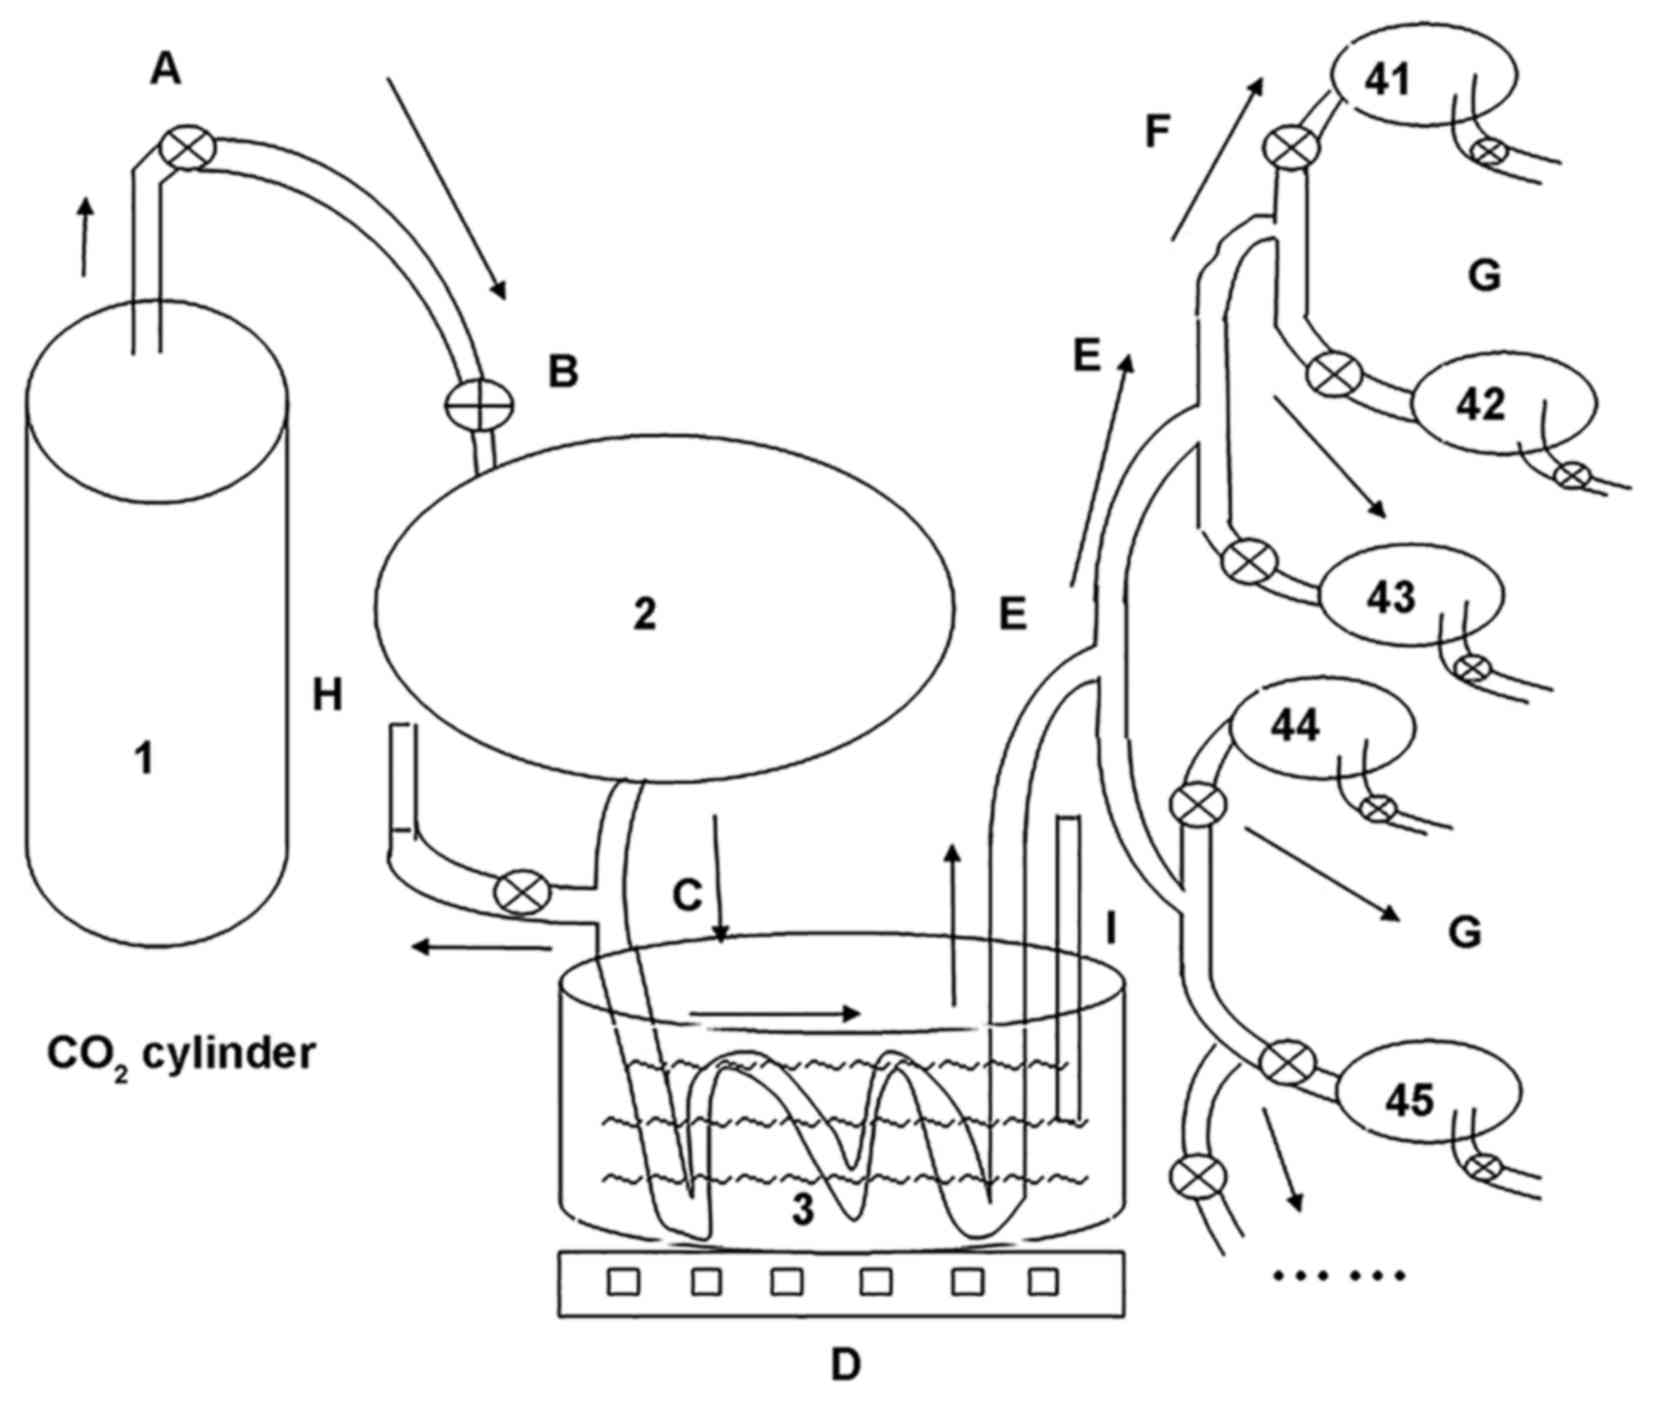 fisher valve diagram bing images